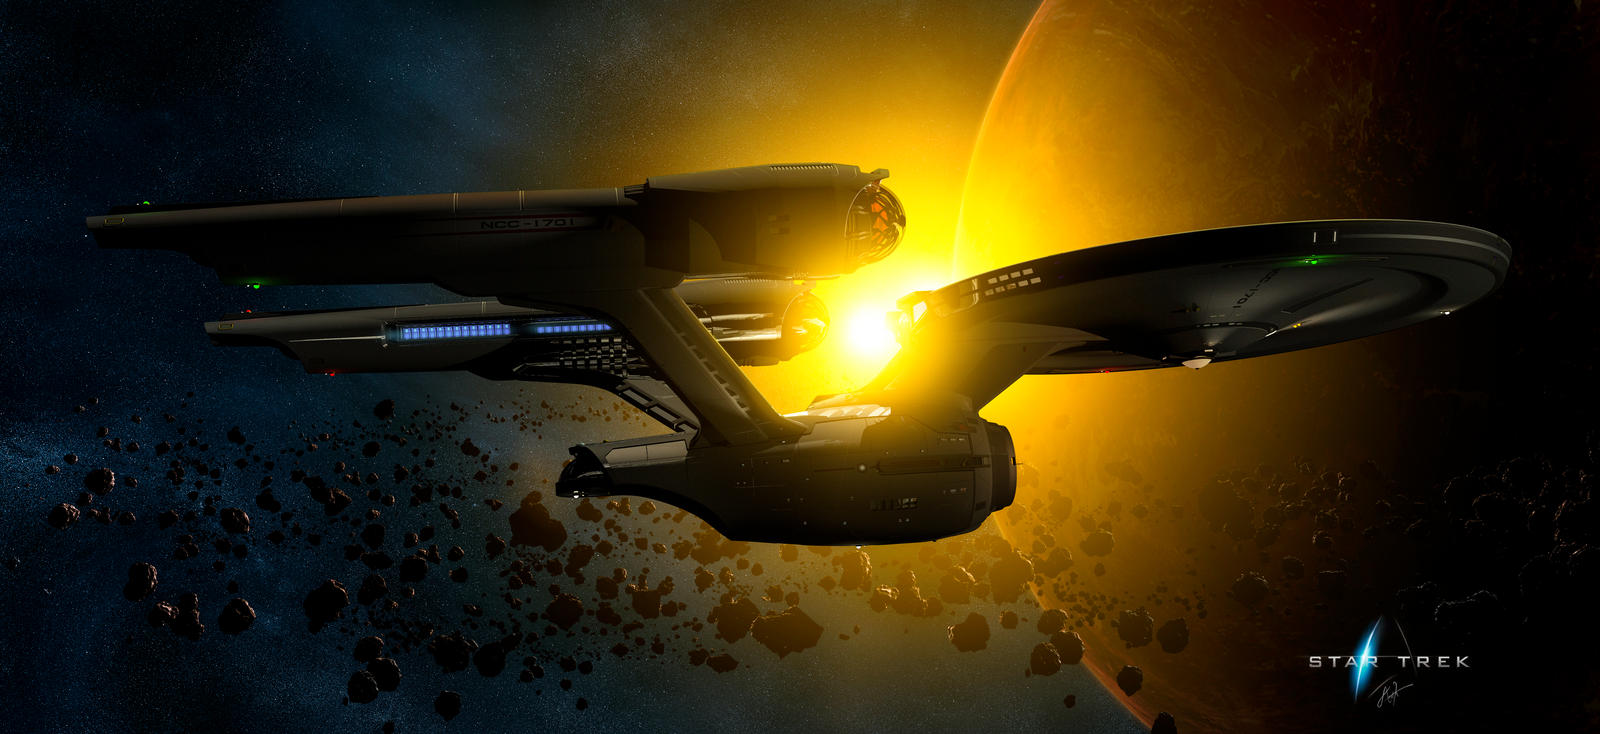 Star Trek - Reimagined CONNIE - Warm Sunrise by rOEN911